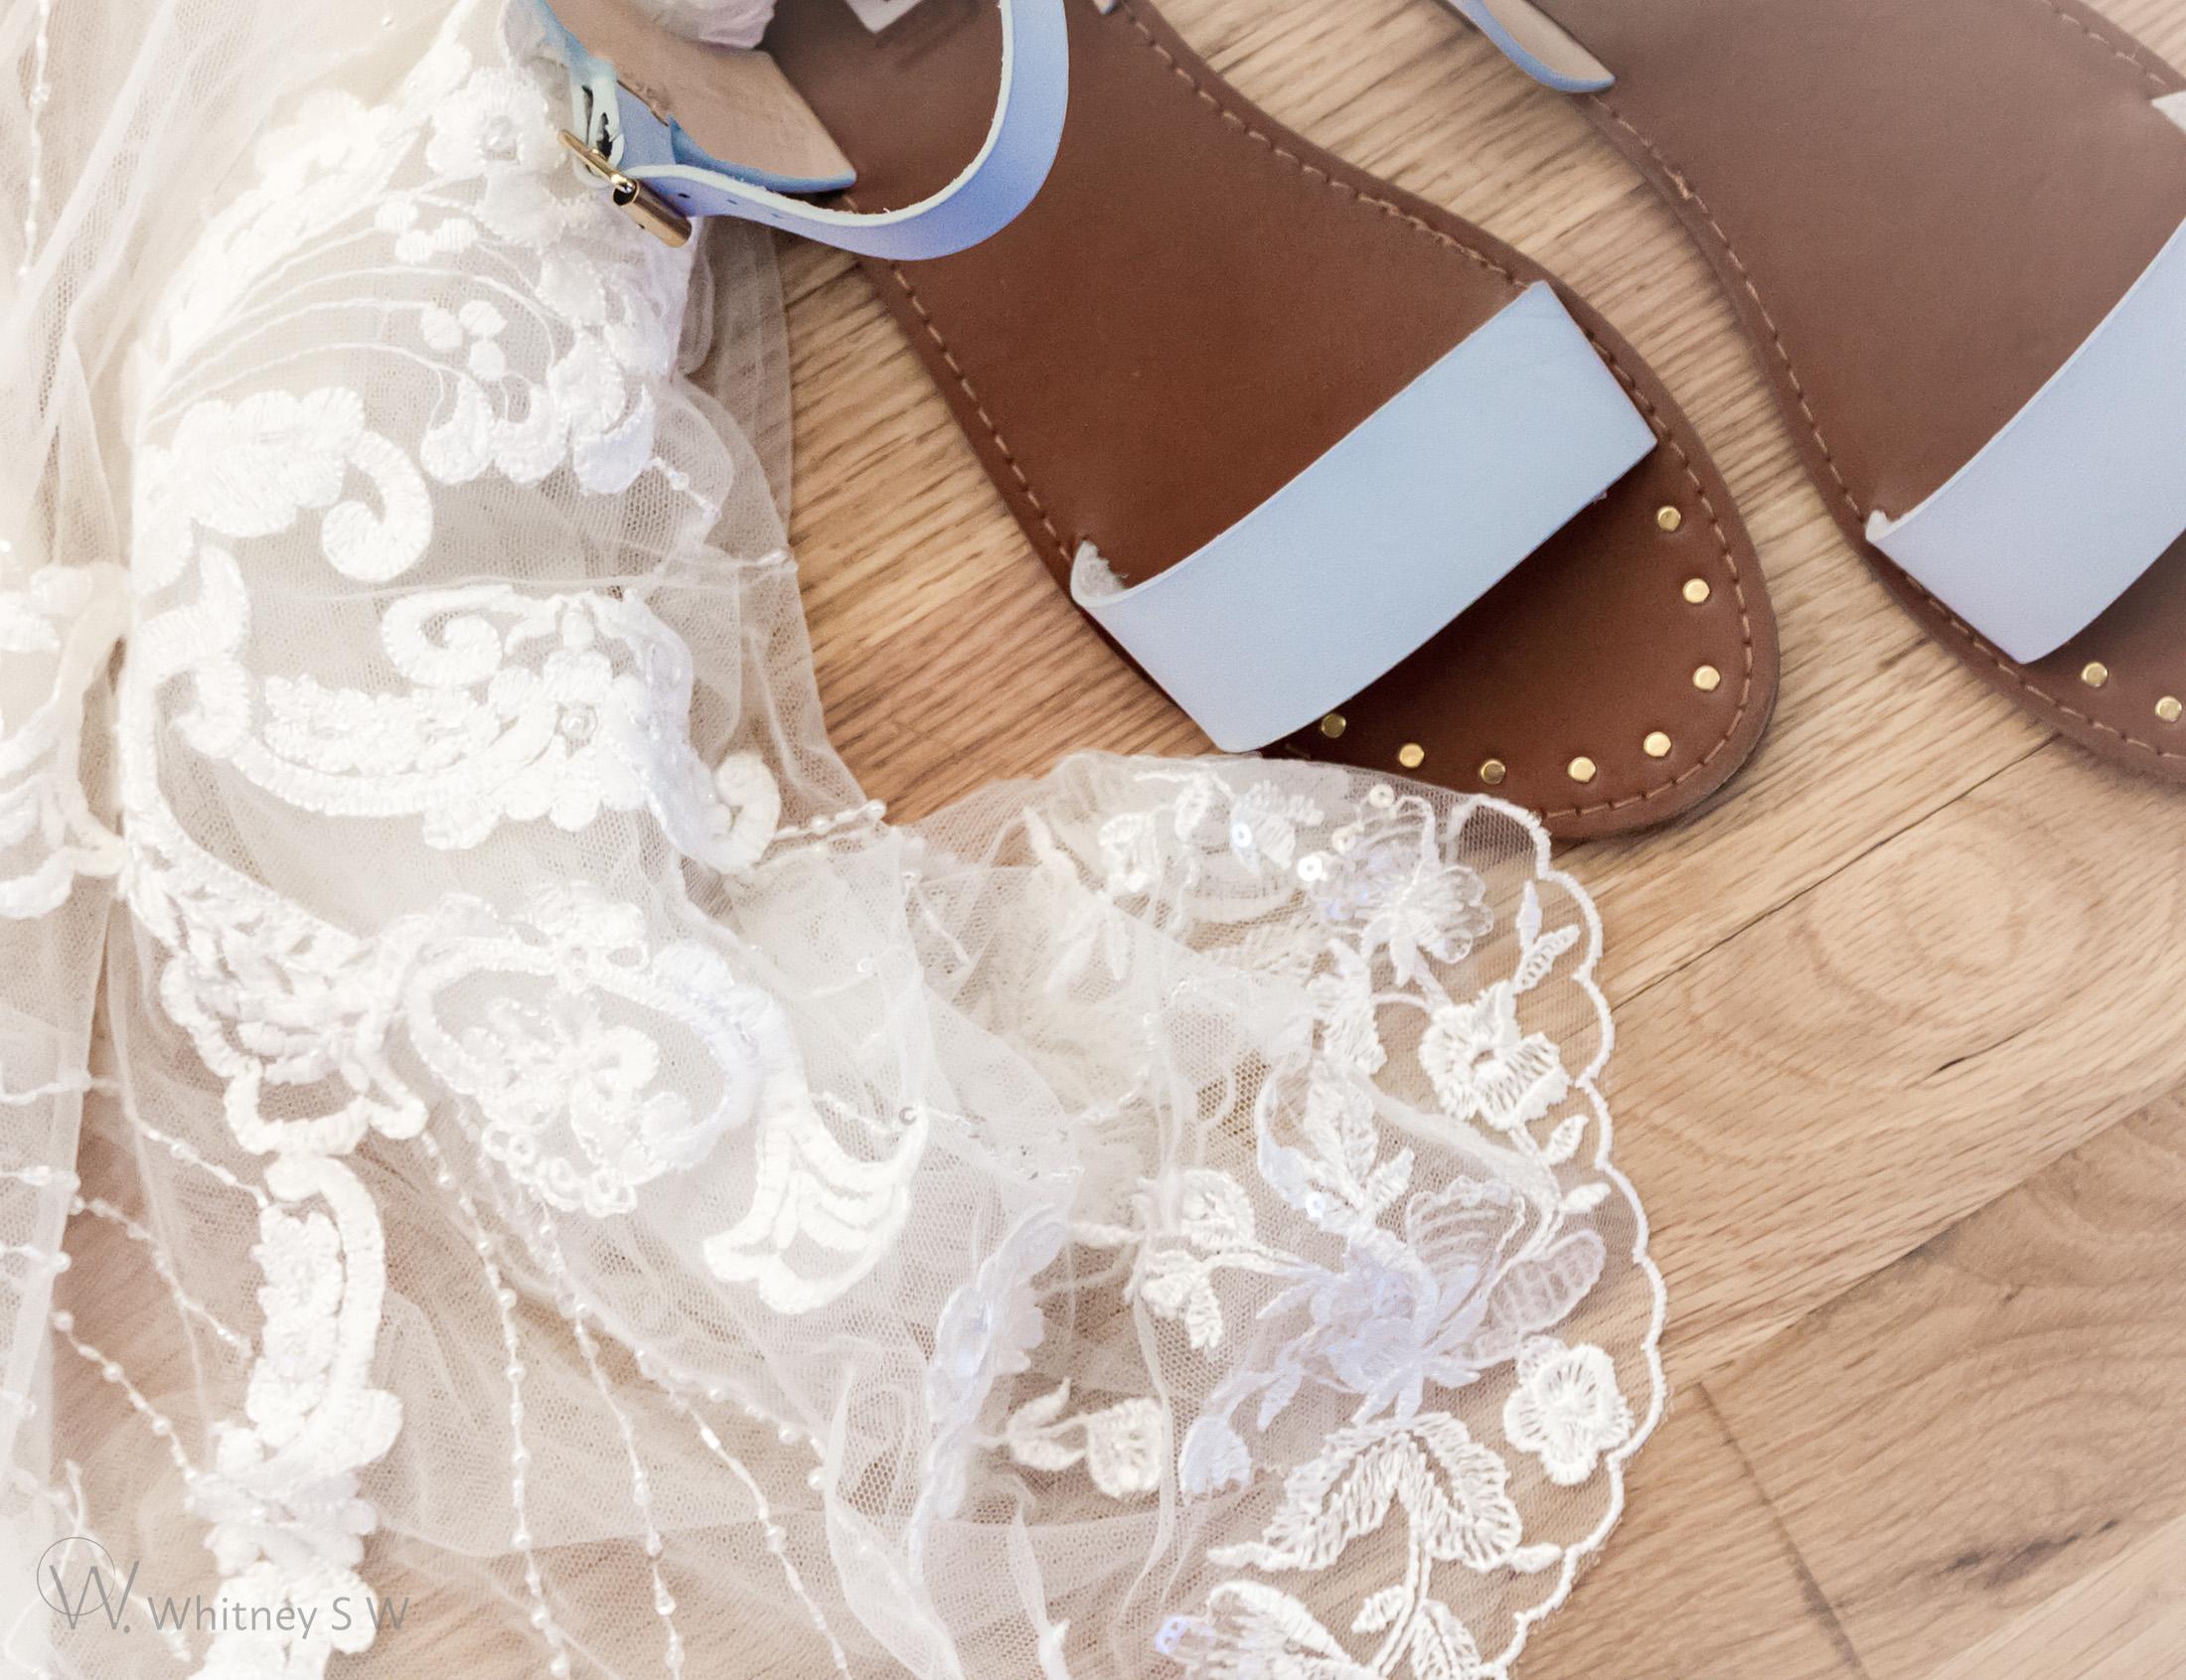 Morgan & Kaivon Wedding - Photography by Whitney S Williams whitneysw (24).jpg